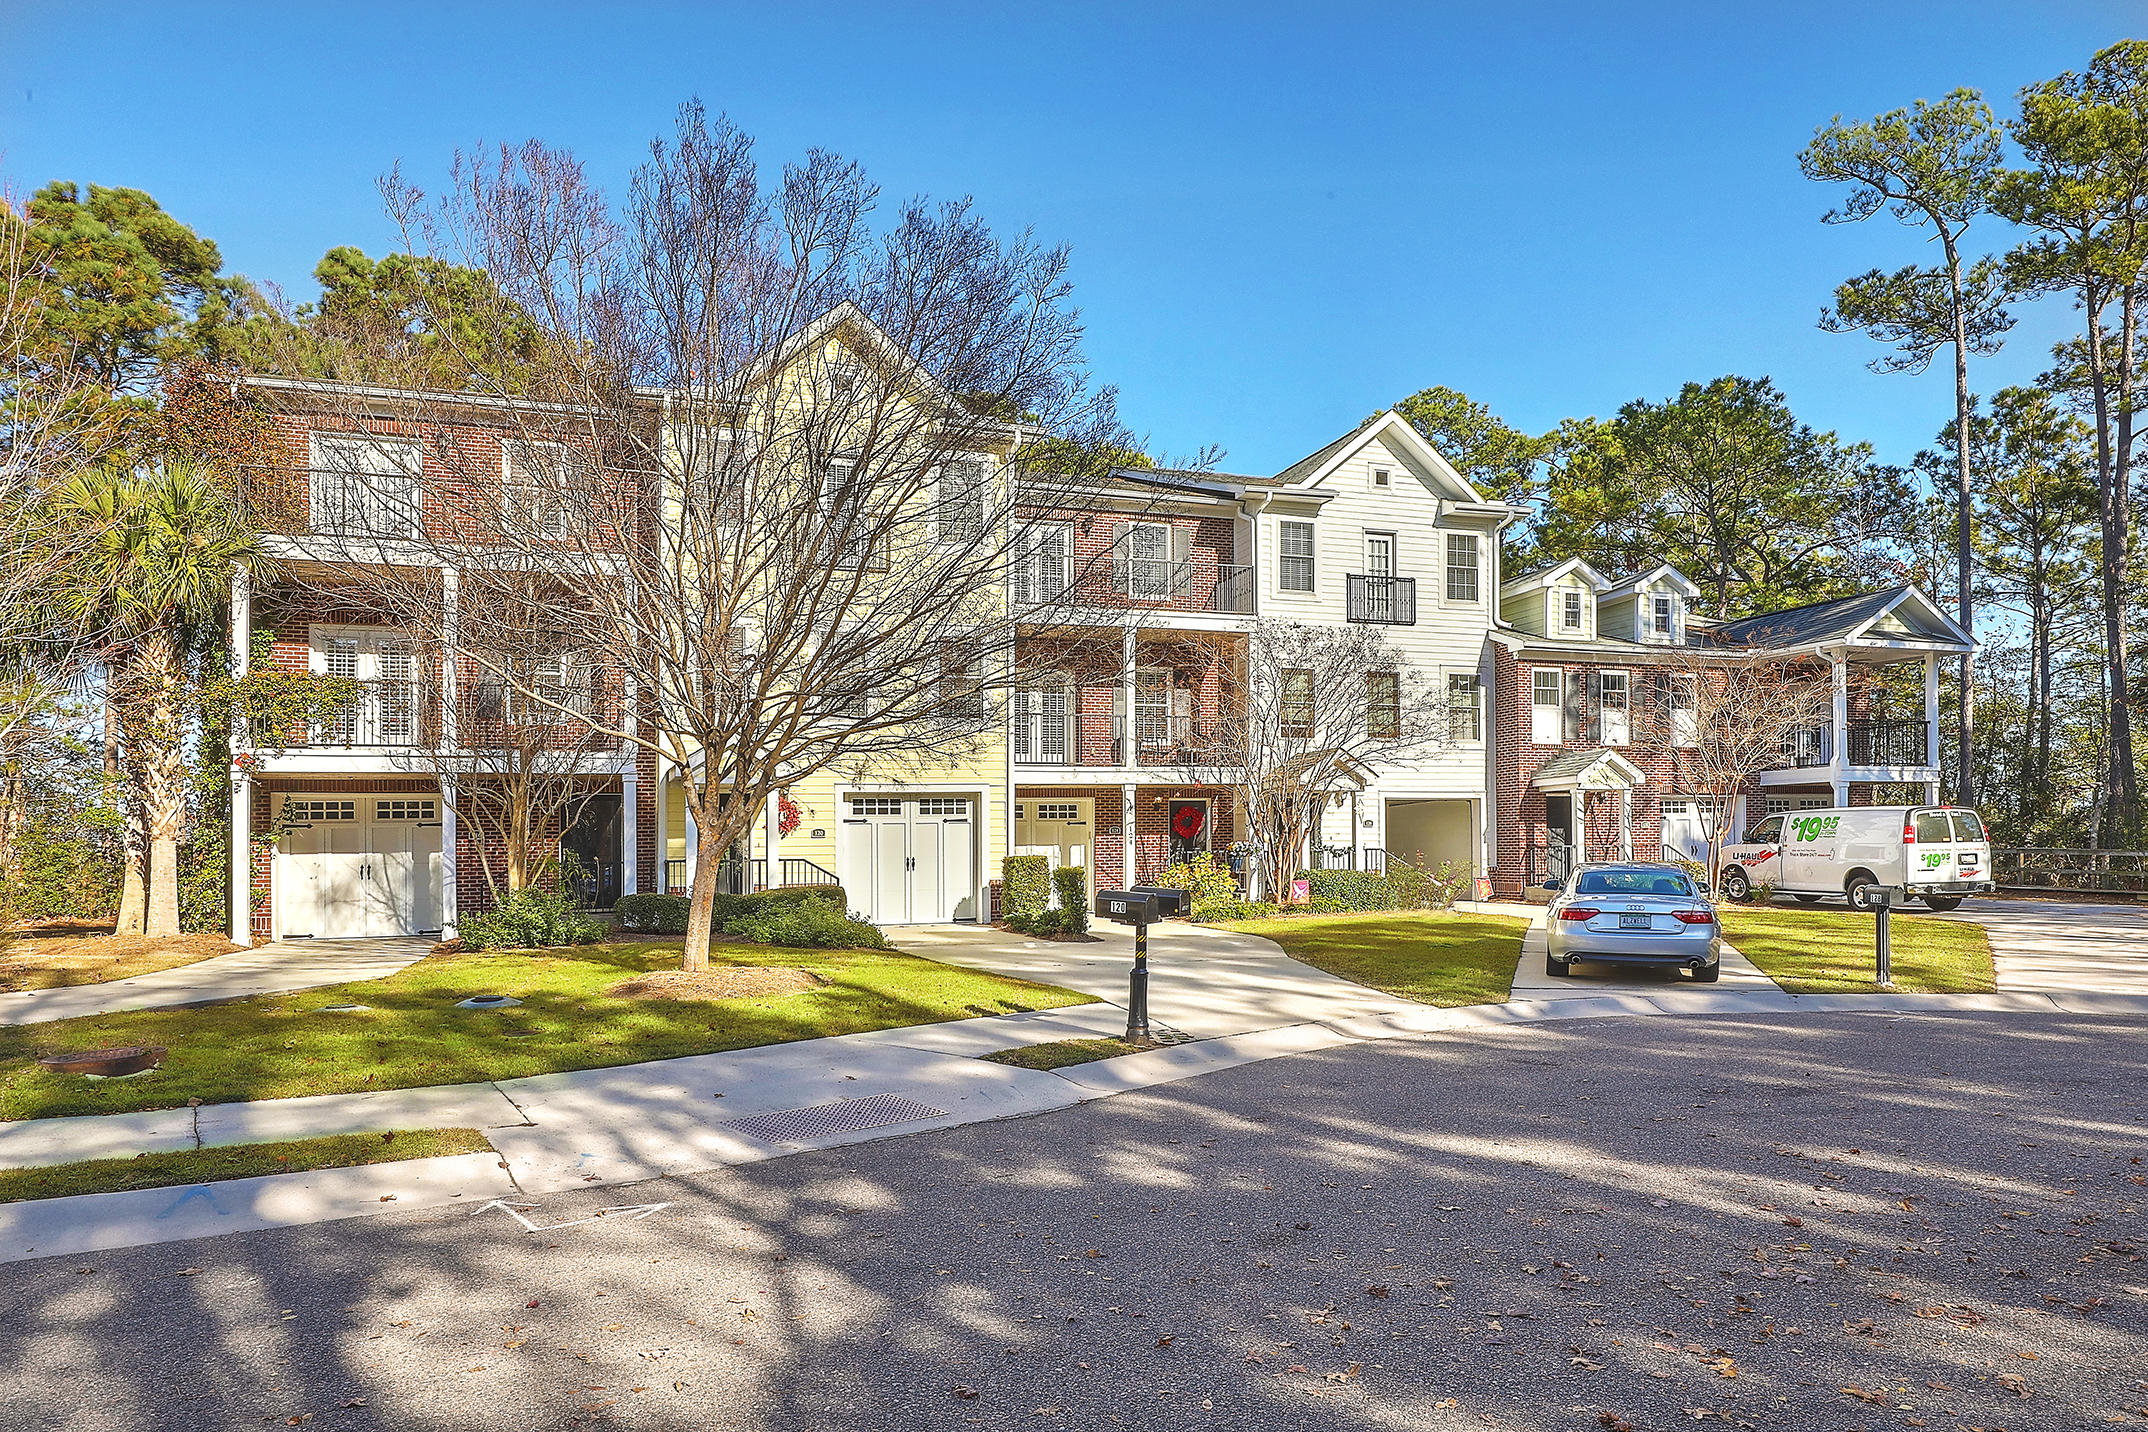 Etiwan Pointe Homes For Sale - 124 Winding Creek, Mount Pleasant, SC - 6